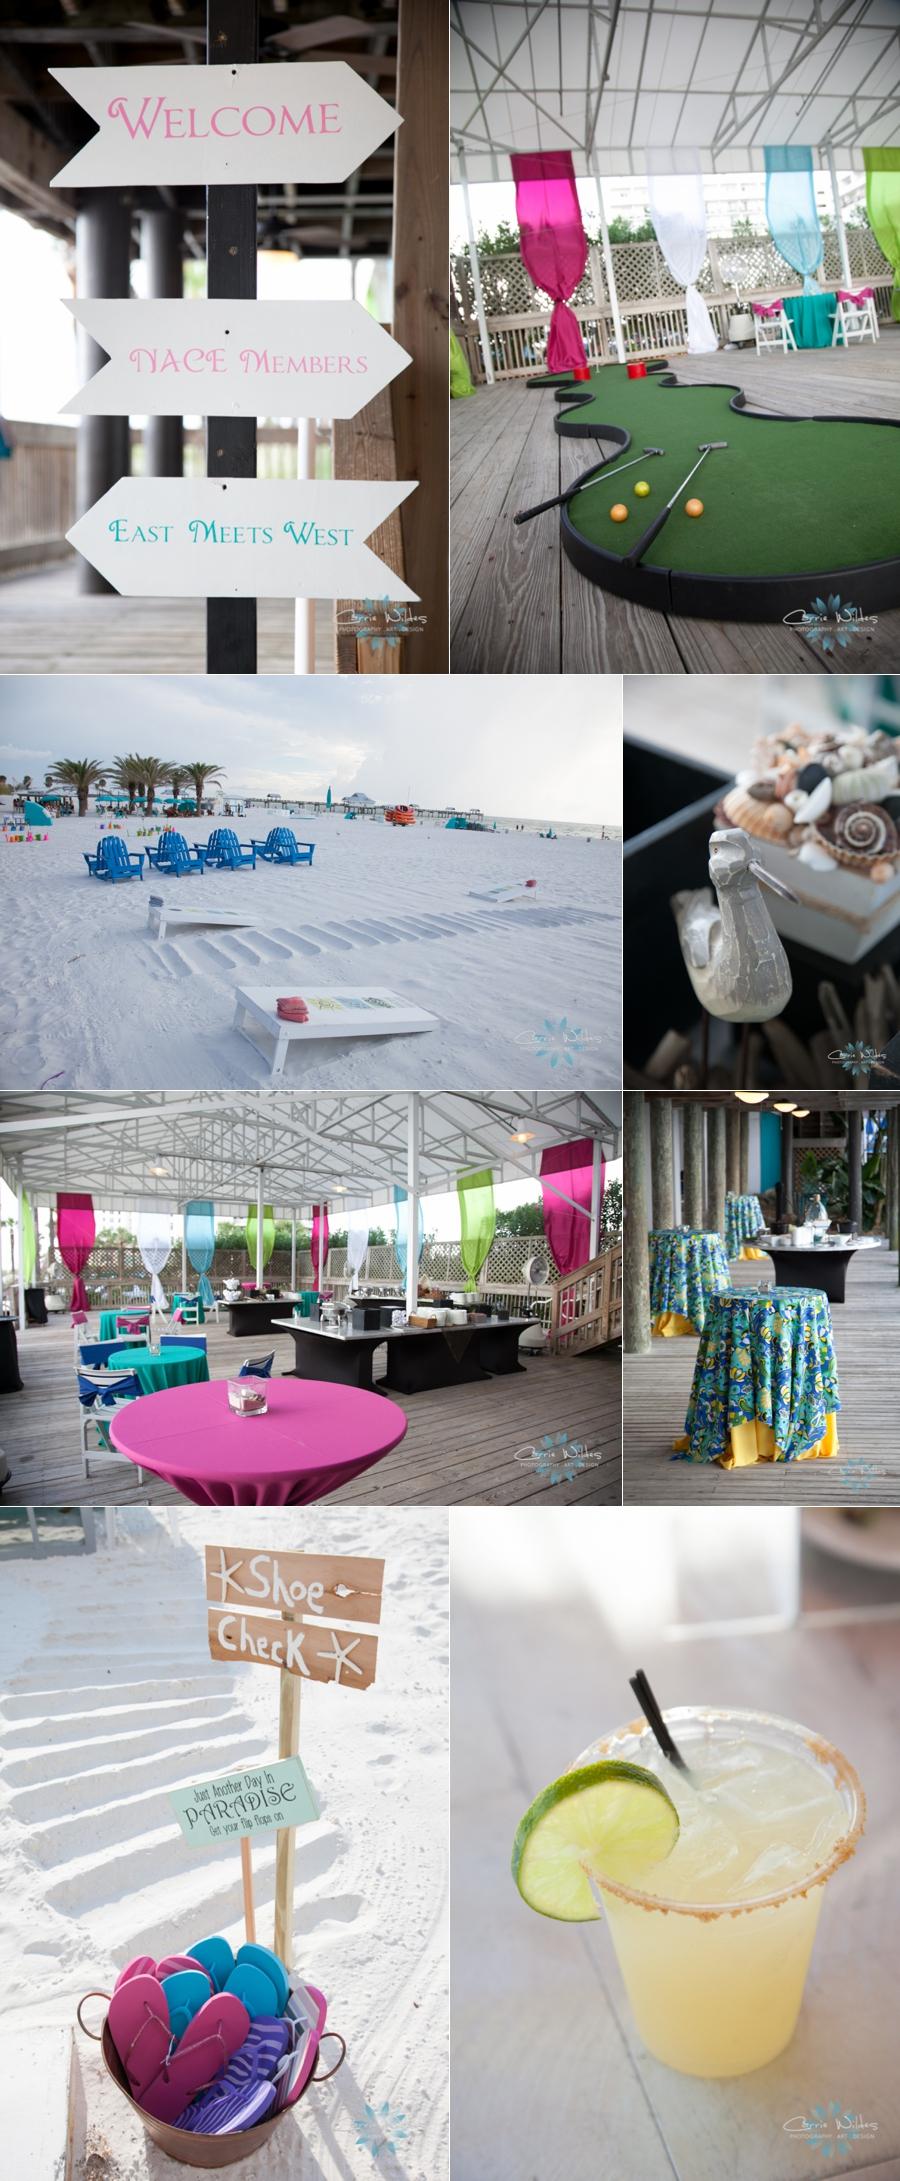 8_20_13 NACE Meeting Hilton Clearwater Beach_0001.jpg